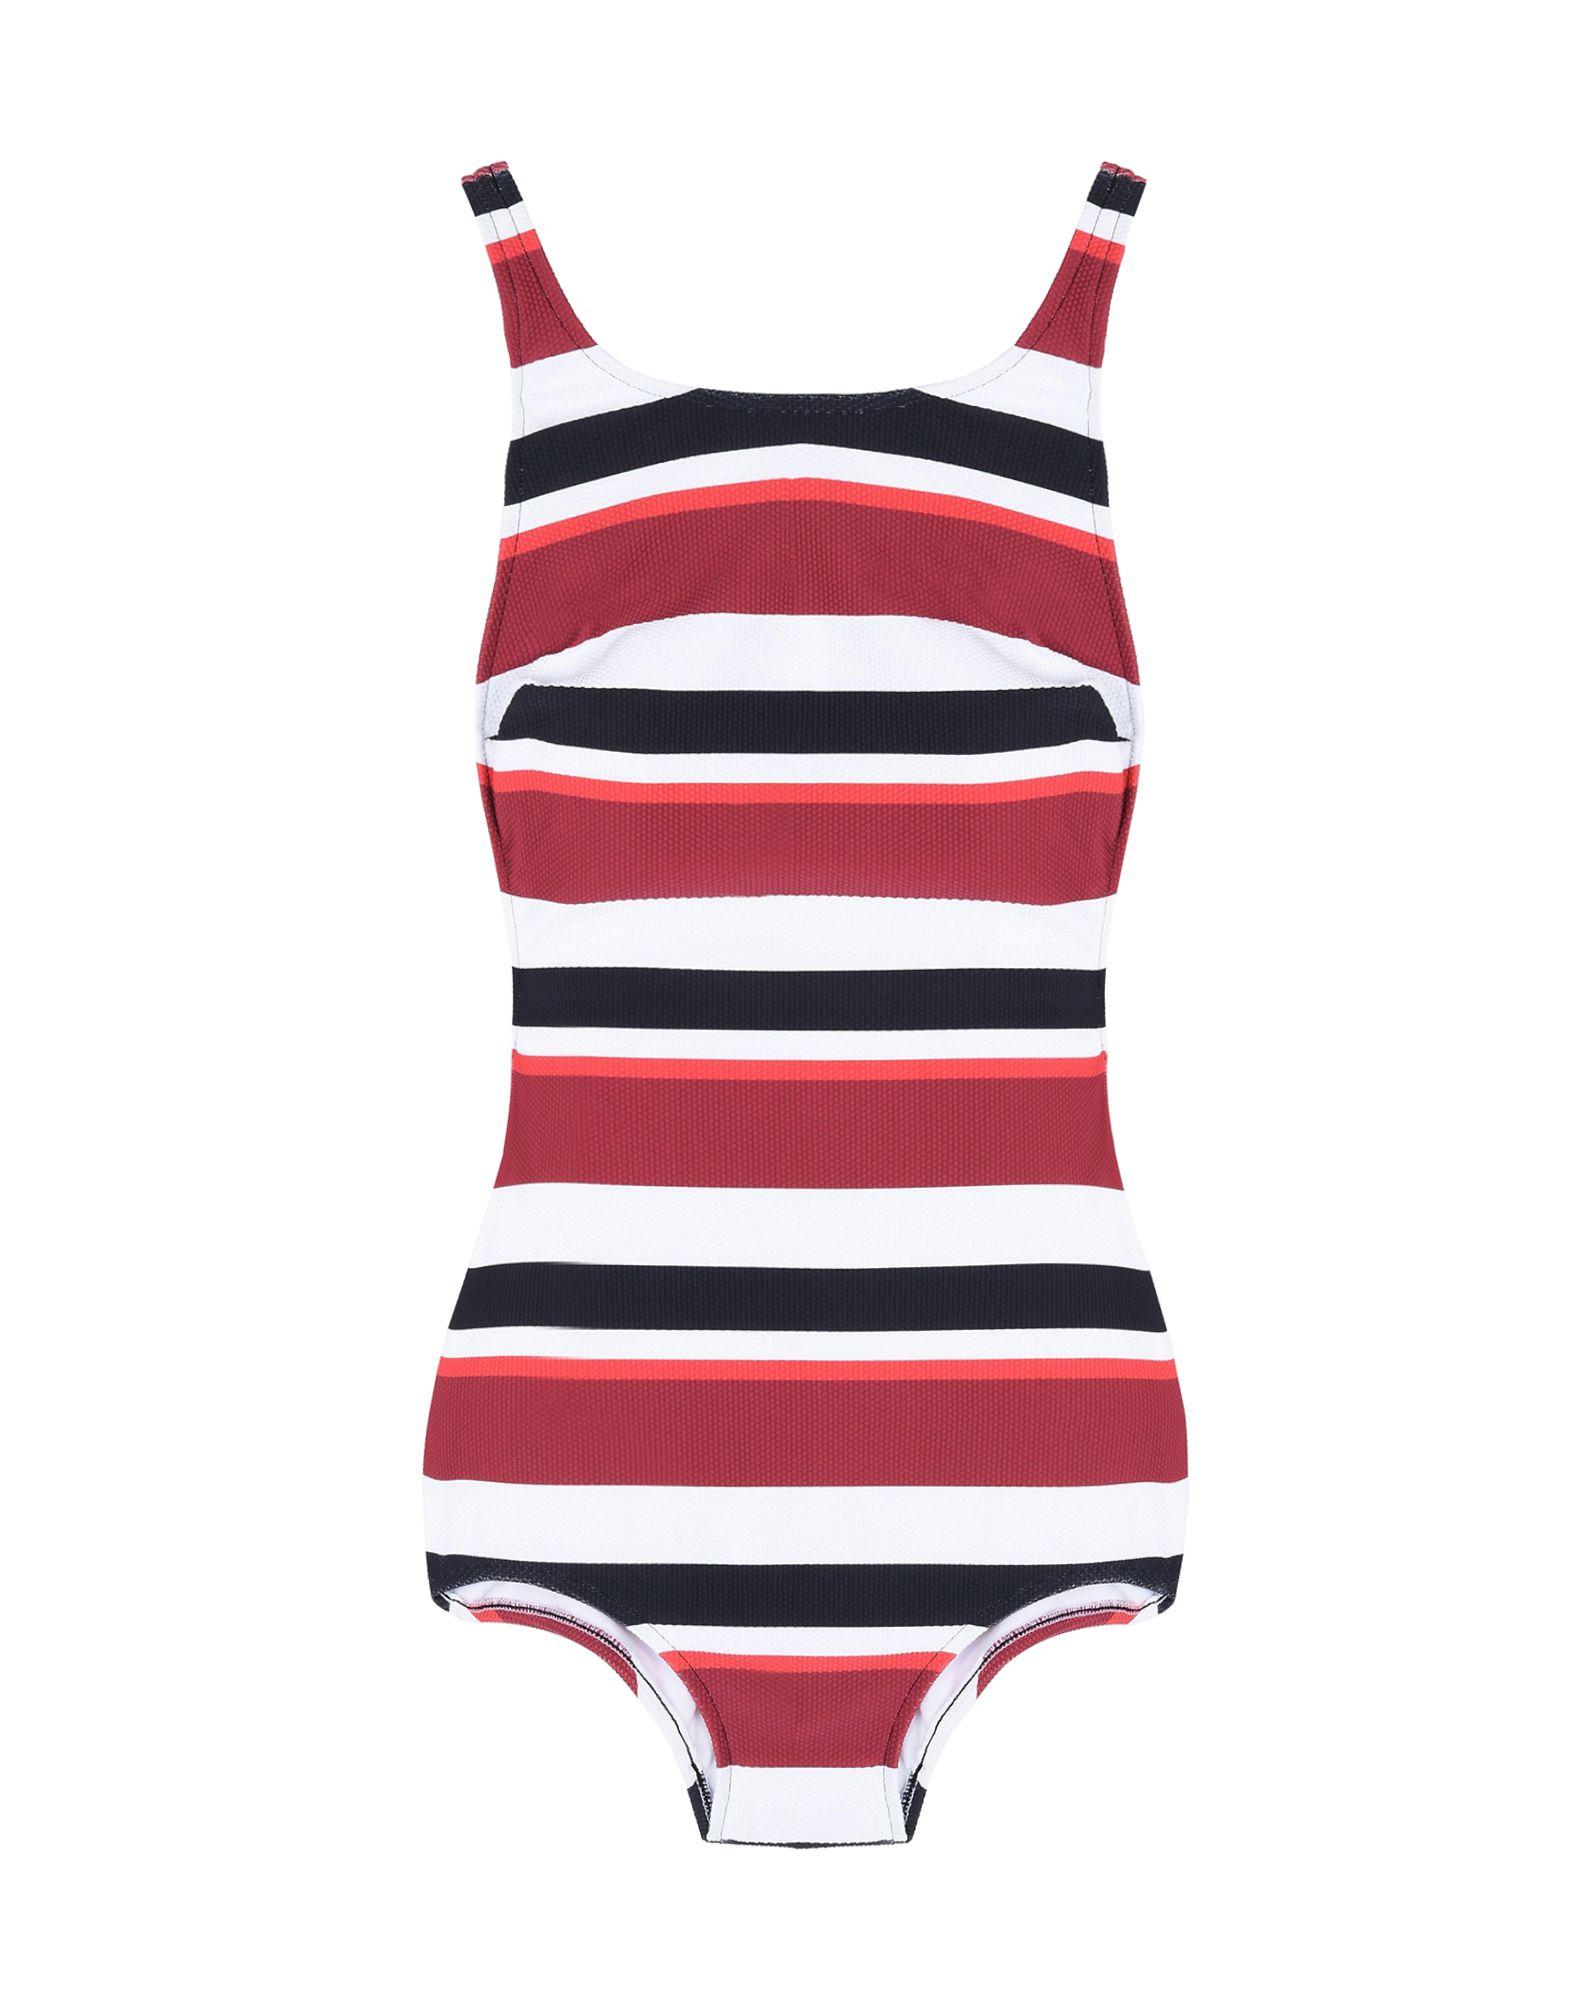 BIANCA BALTI Слитный купальник слитный купальник mia lover купальник lc410067 6